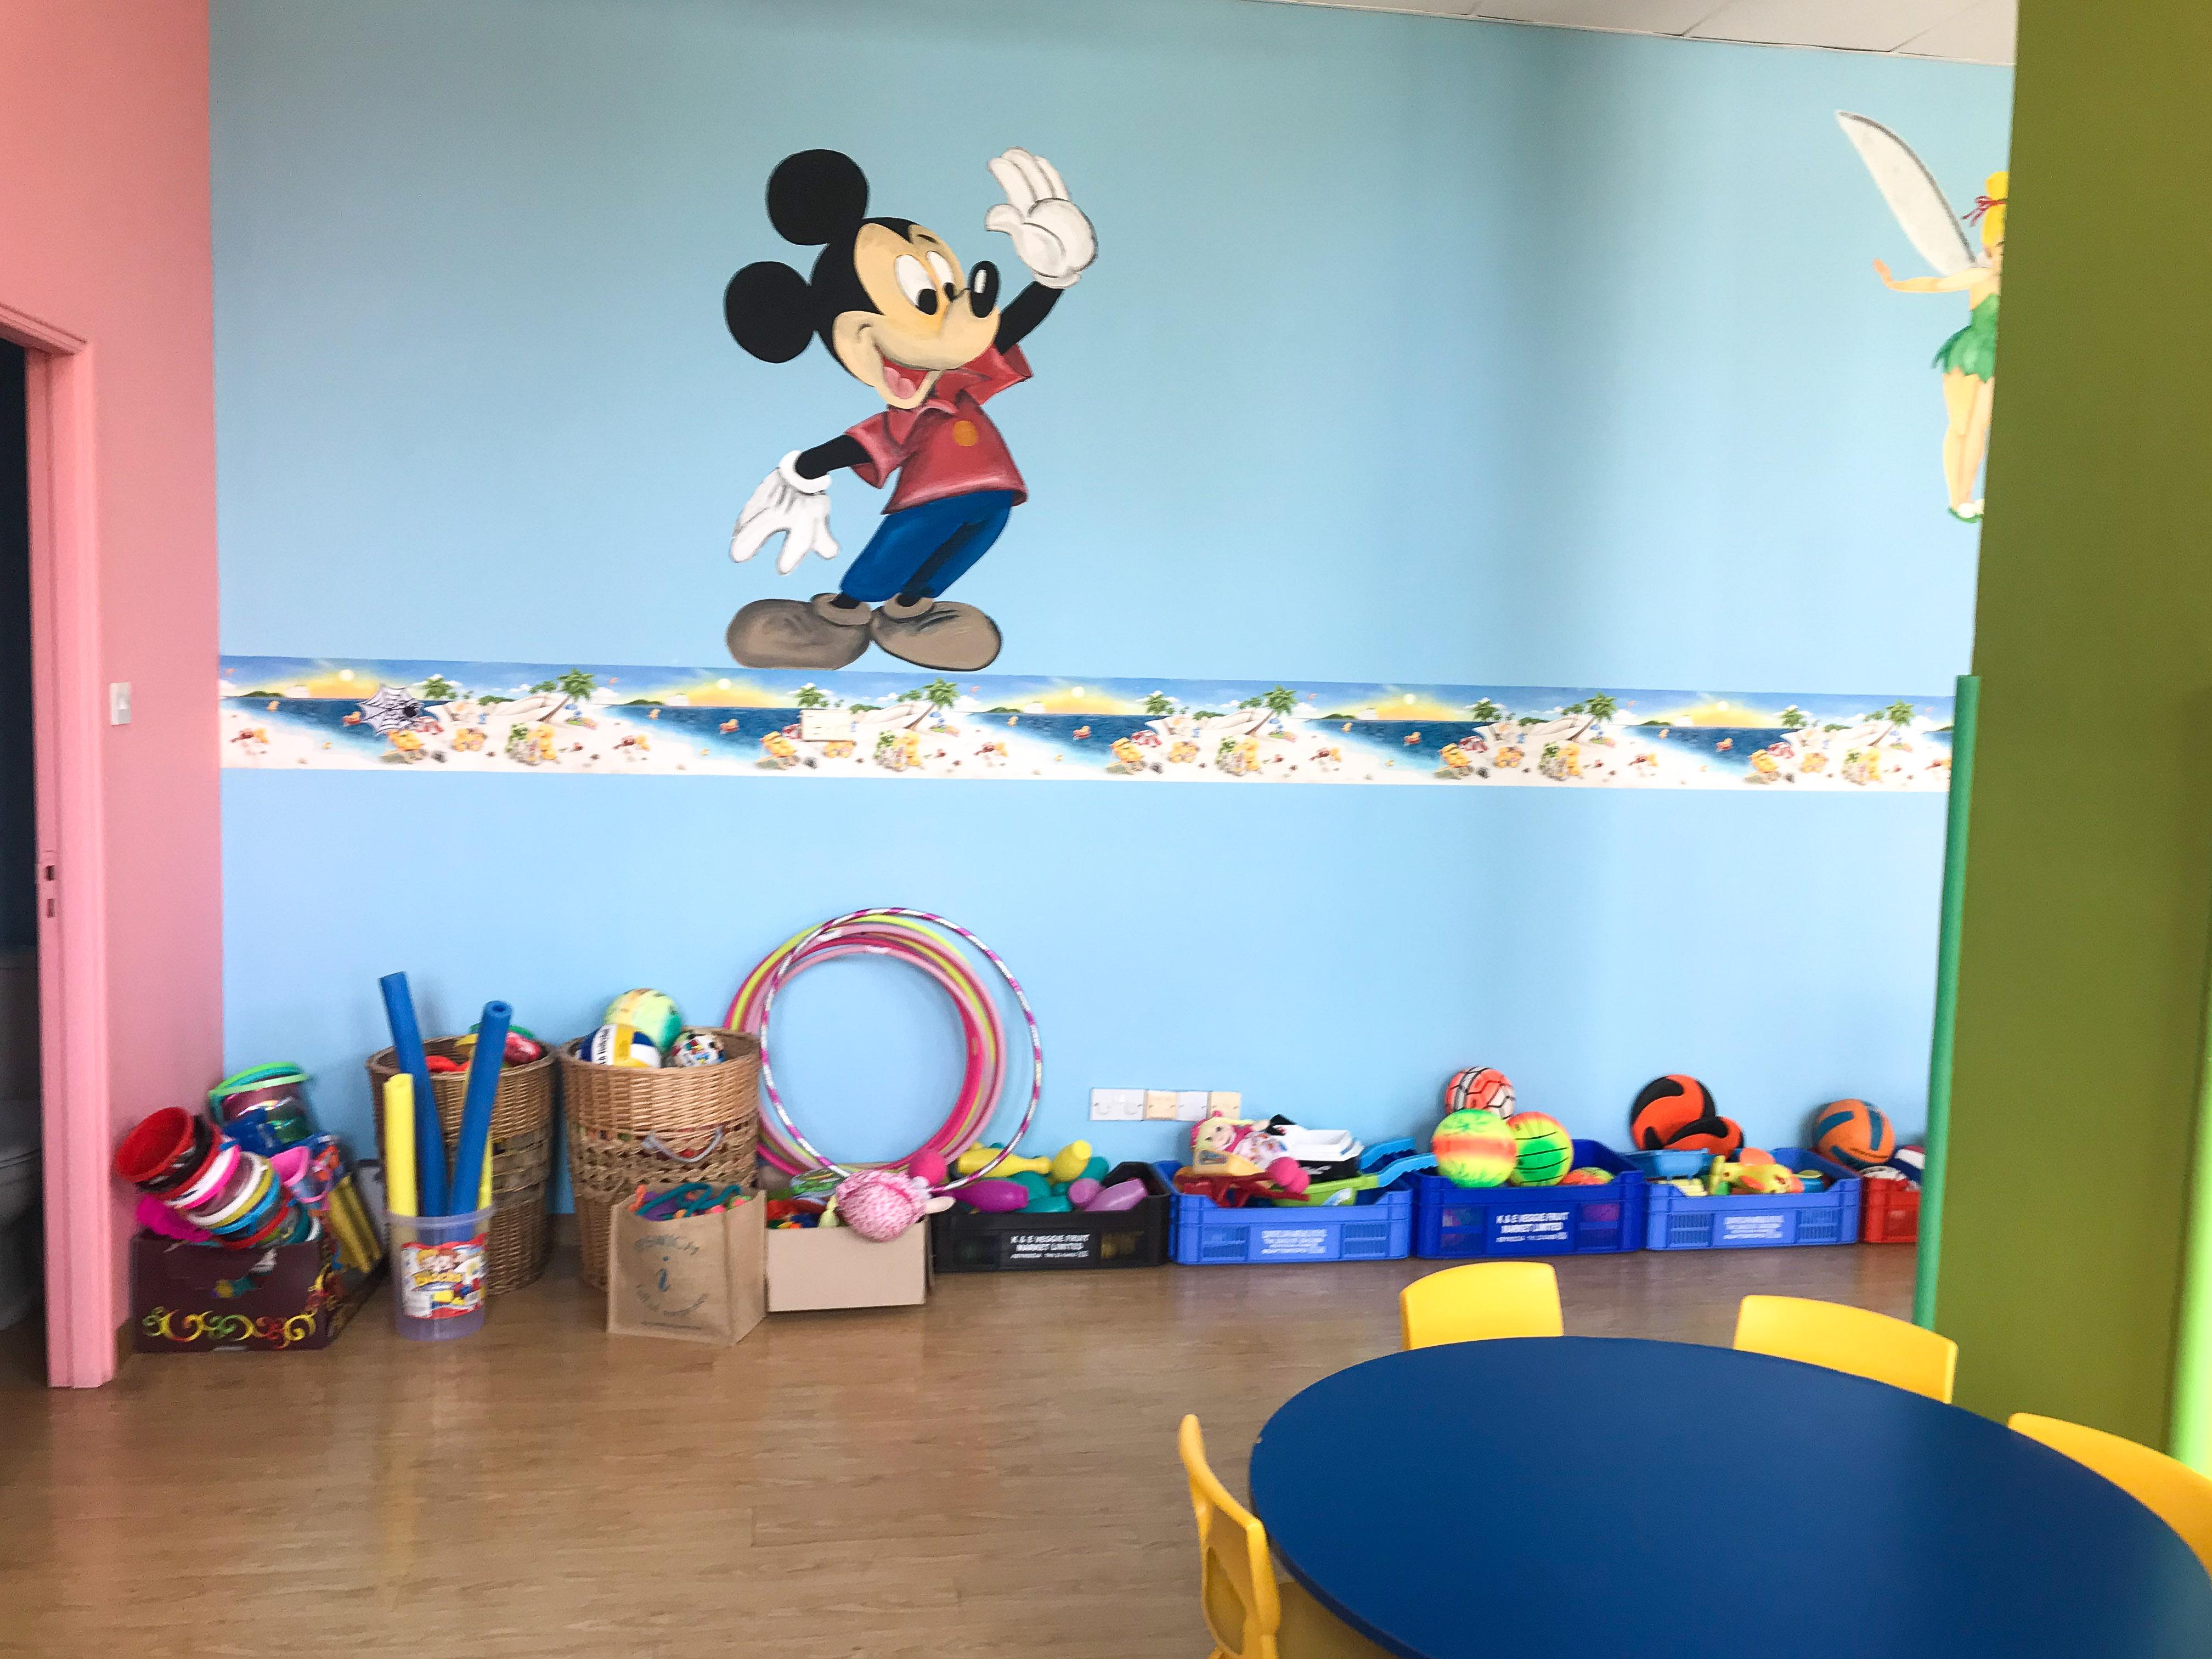 best hotels for kids in cyprus - Athena Beach Hotel Cyprus Kid's Club